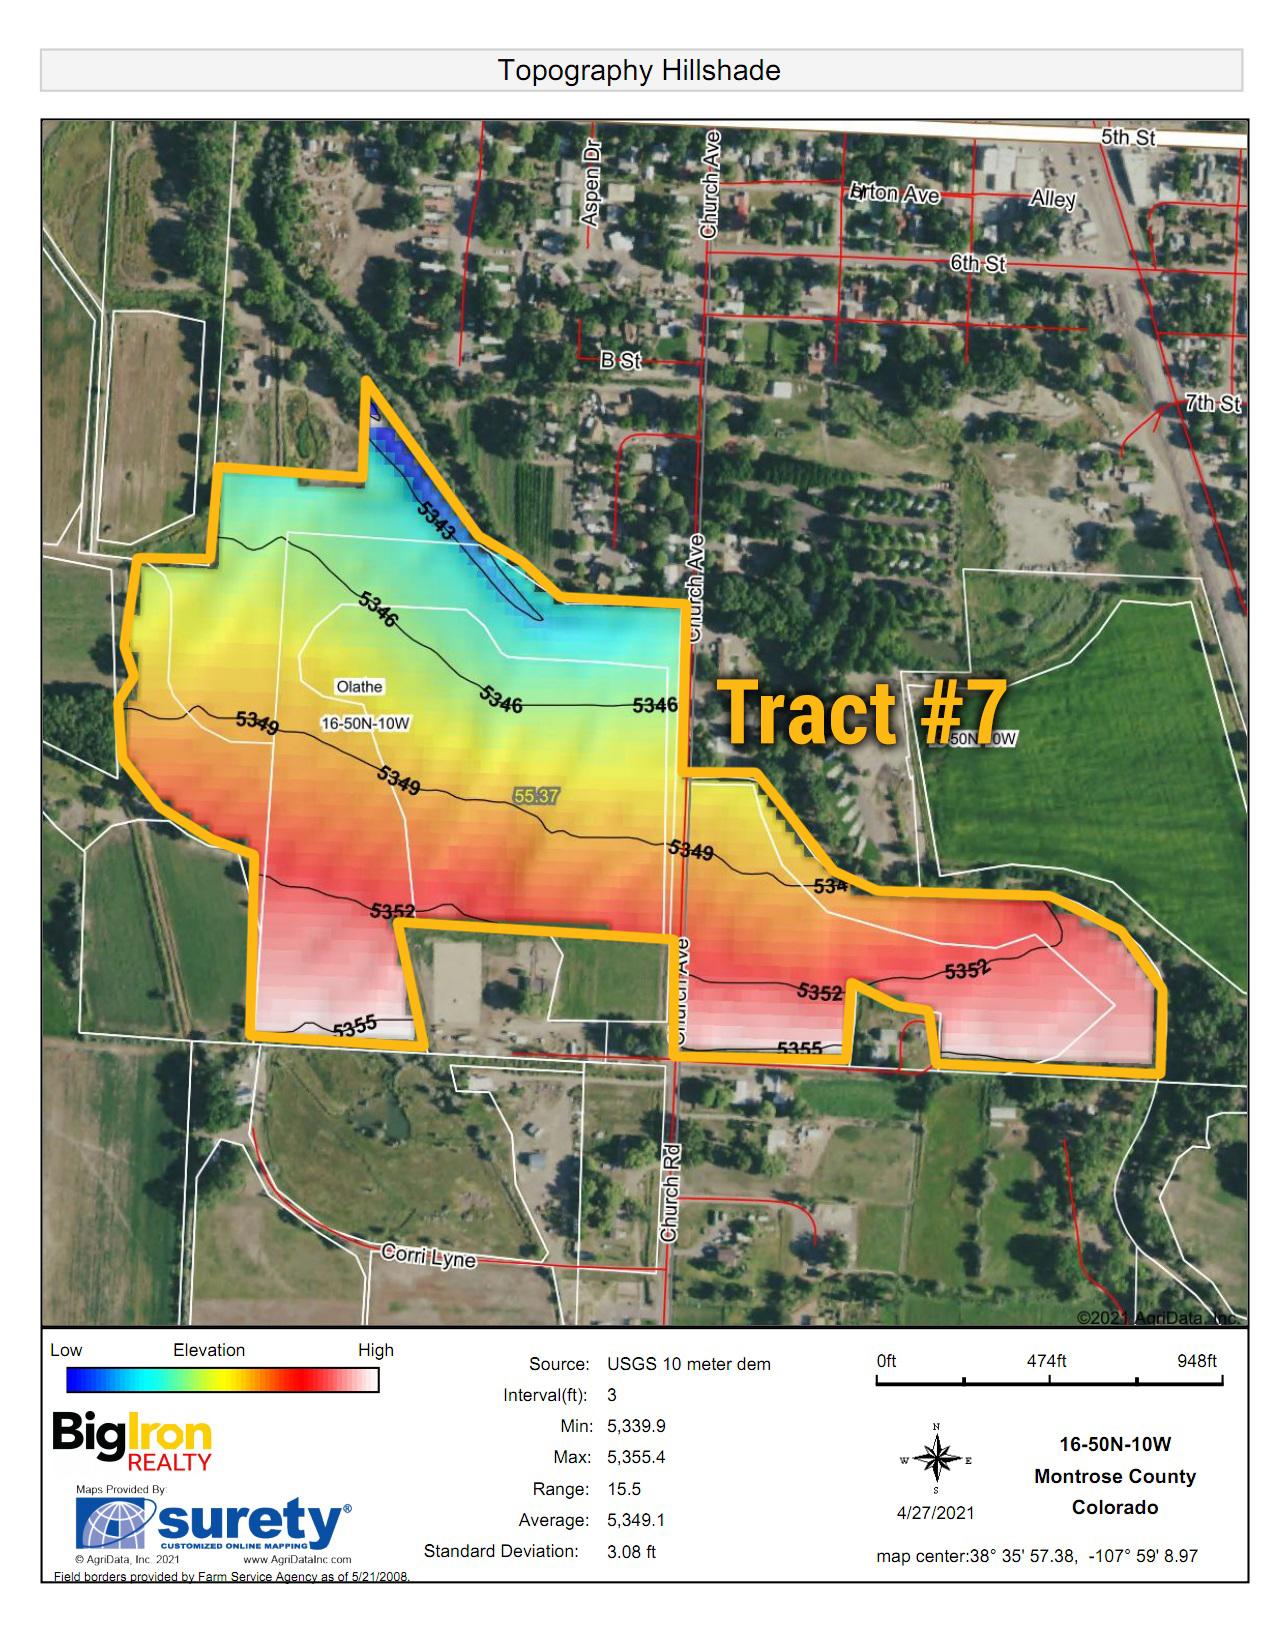 7 Topography Hillshade_BIR-2119